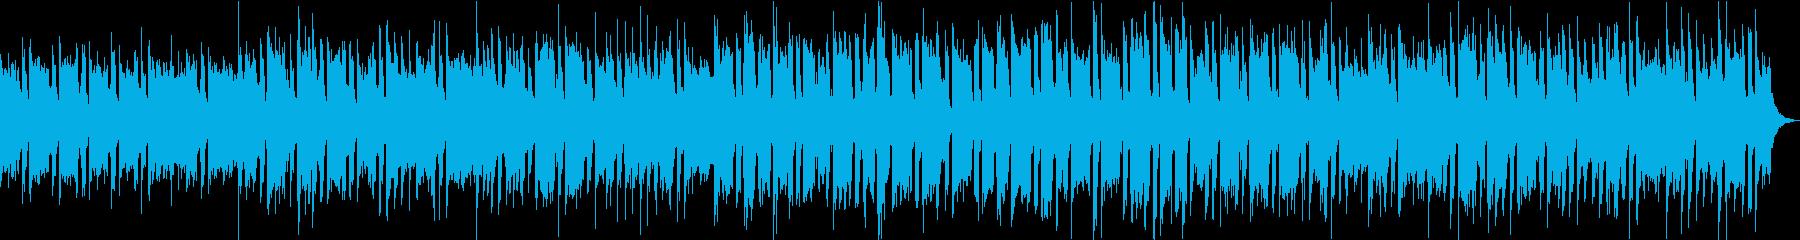 CM向け明るくコミカルなBGMの再生済みの波形